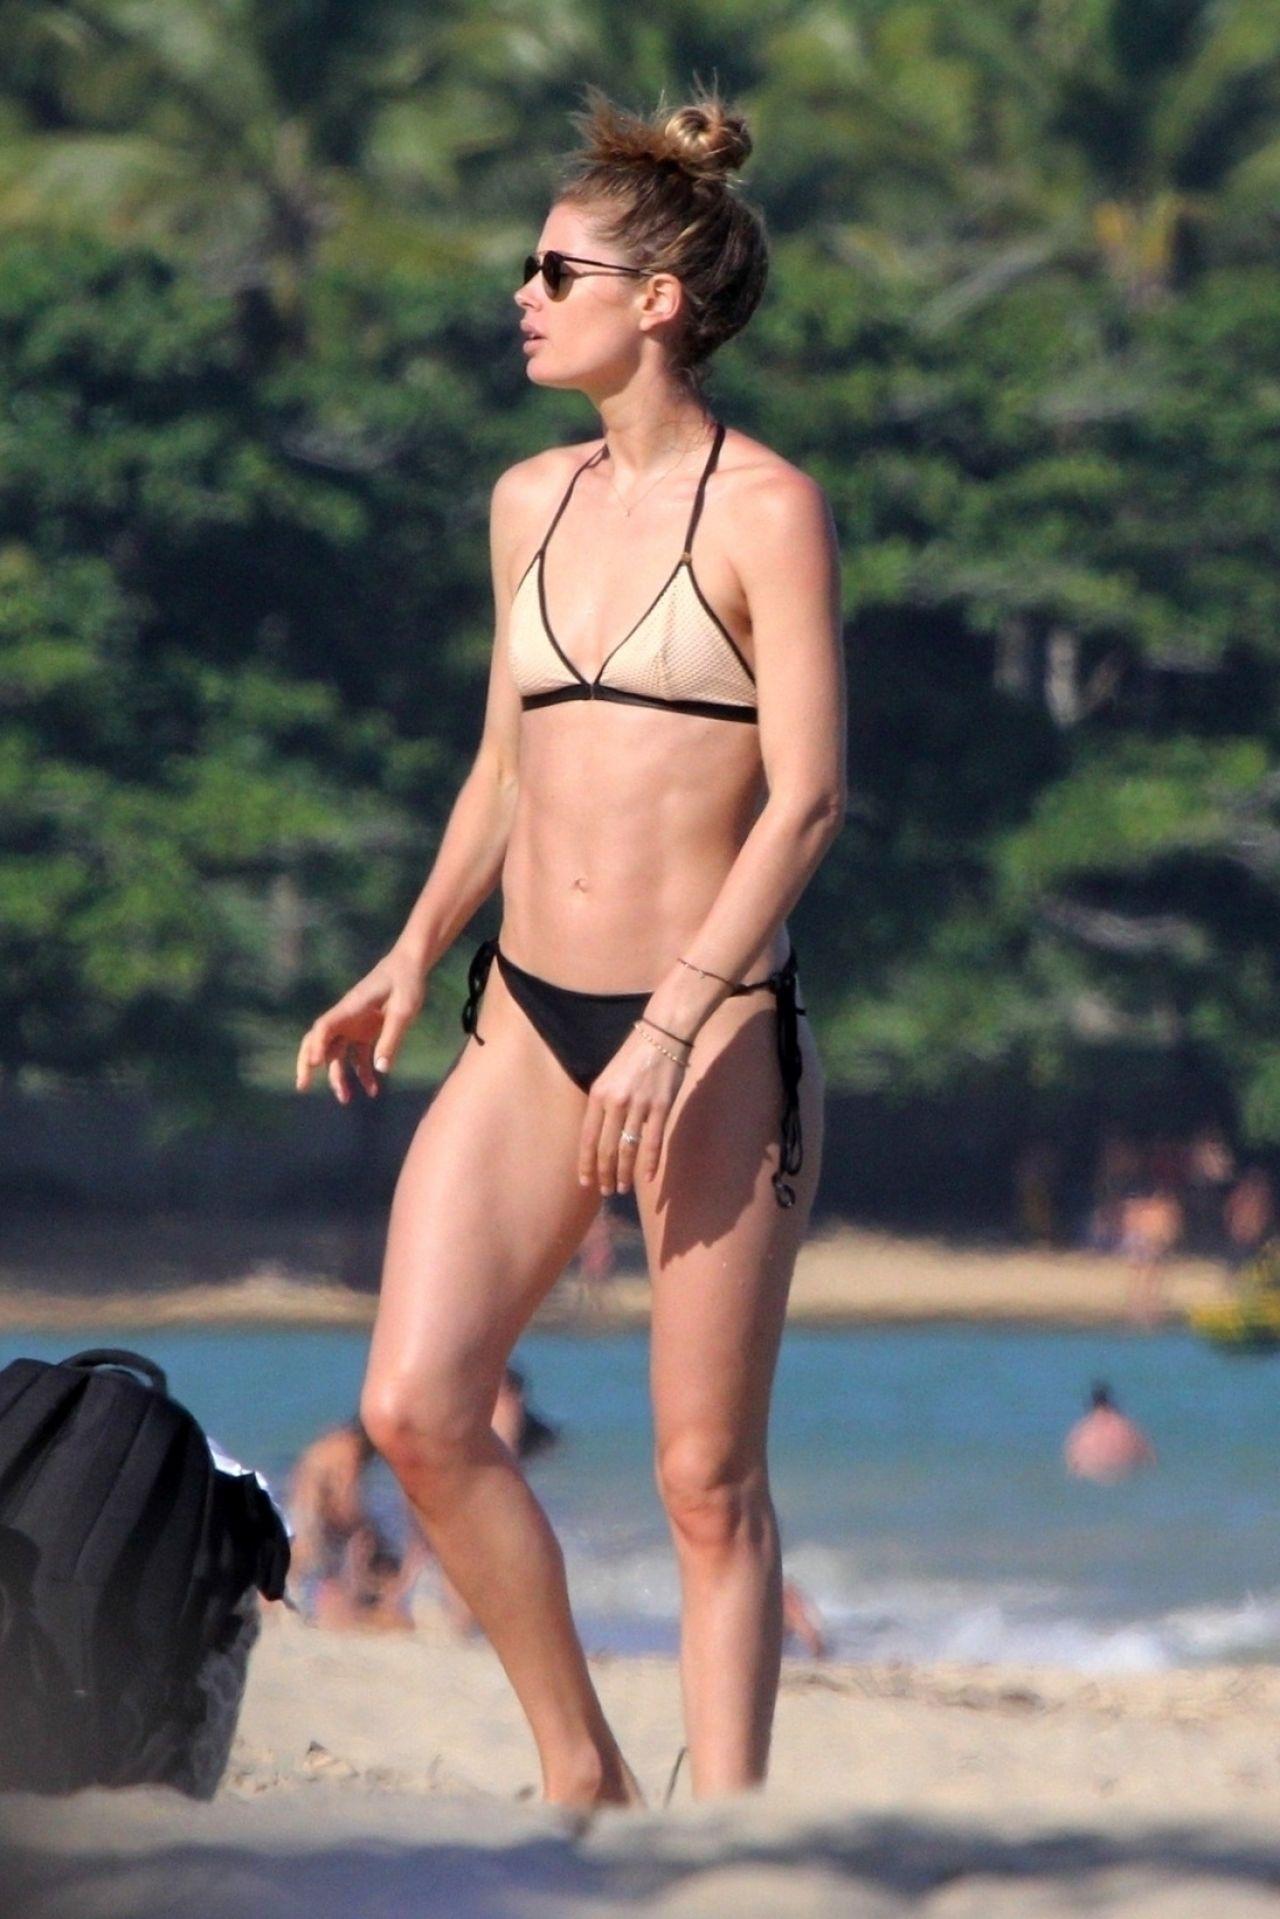 Candice Swanepoel and Doutzen Kroes in Bikini at Espelho Beach in Bahia Pic 8 of 35